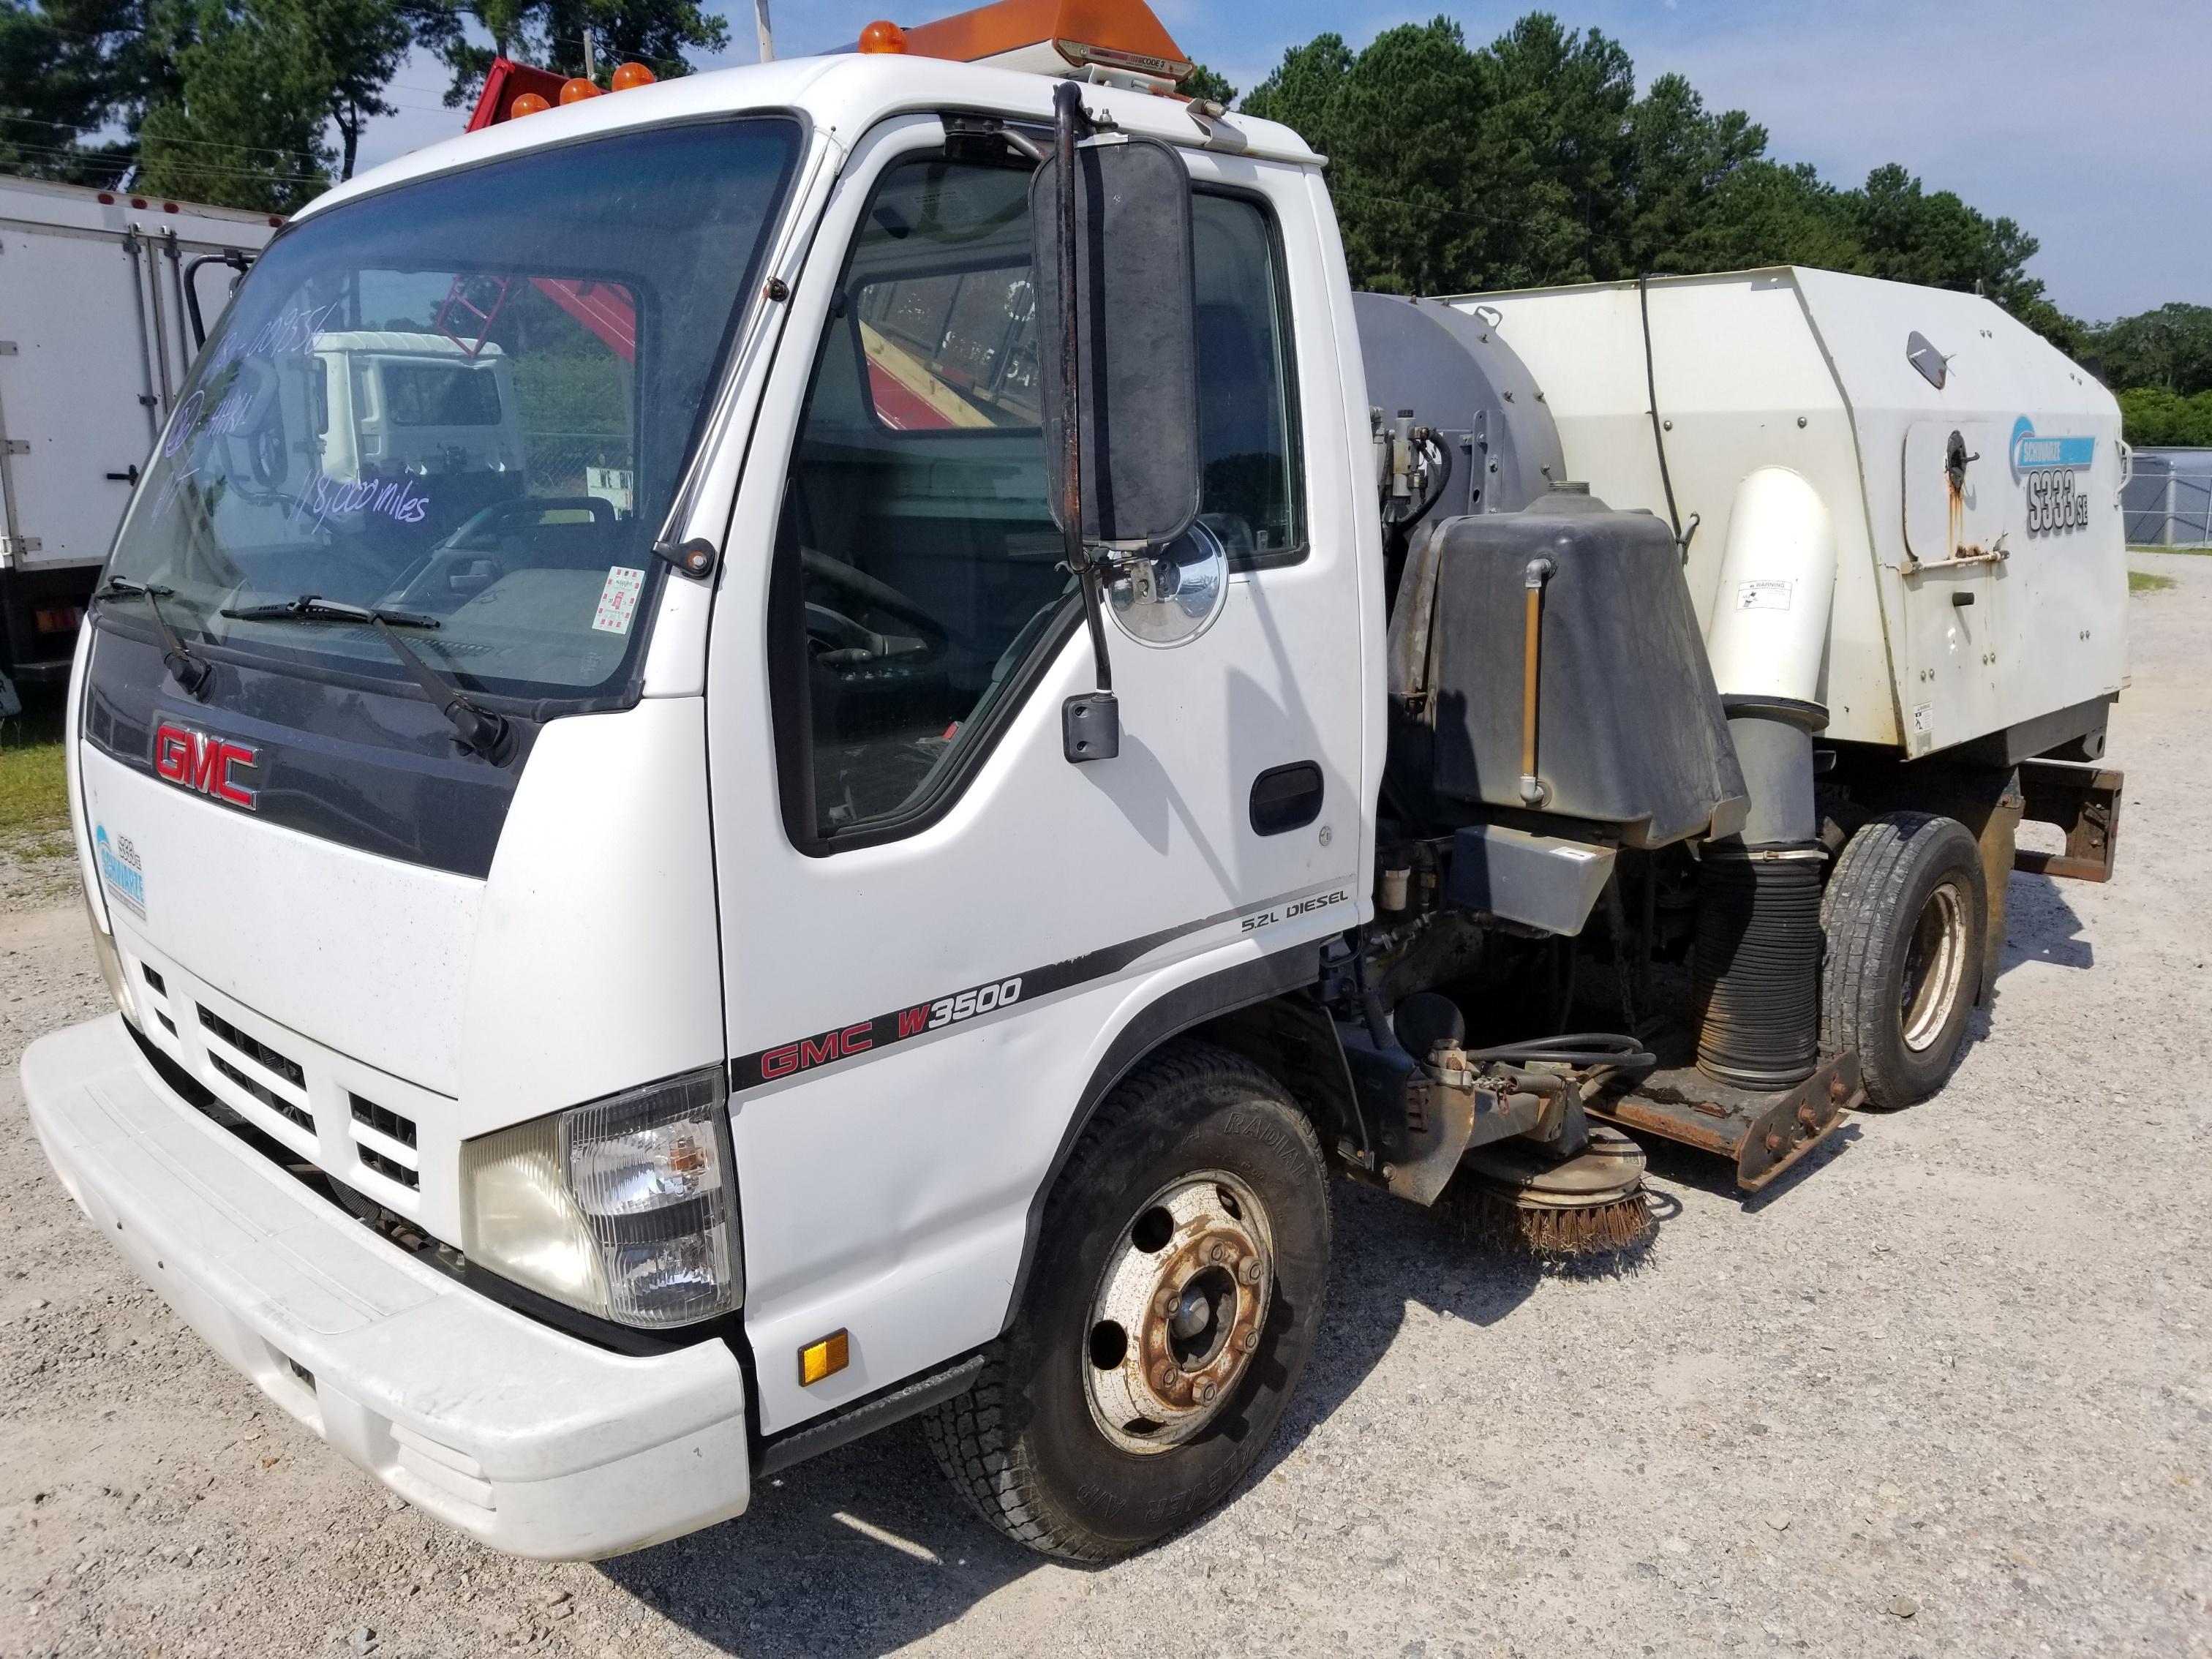 2006 GMC W3500 Sweeper | Isuzu NPR NRR Truck Parts | Busbee